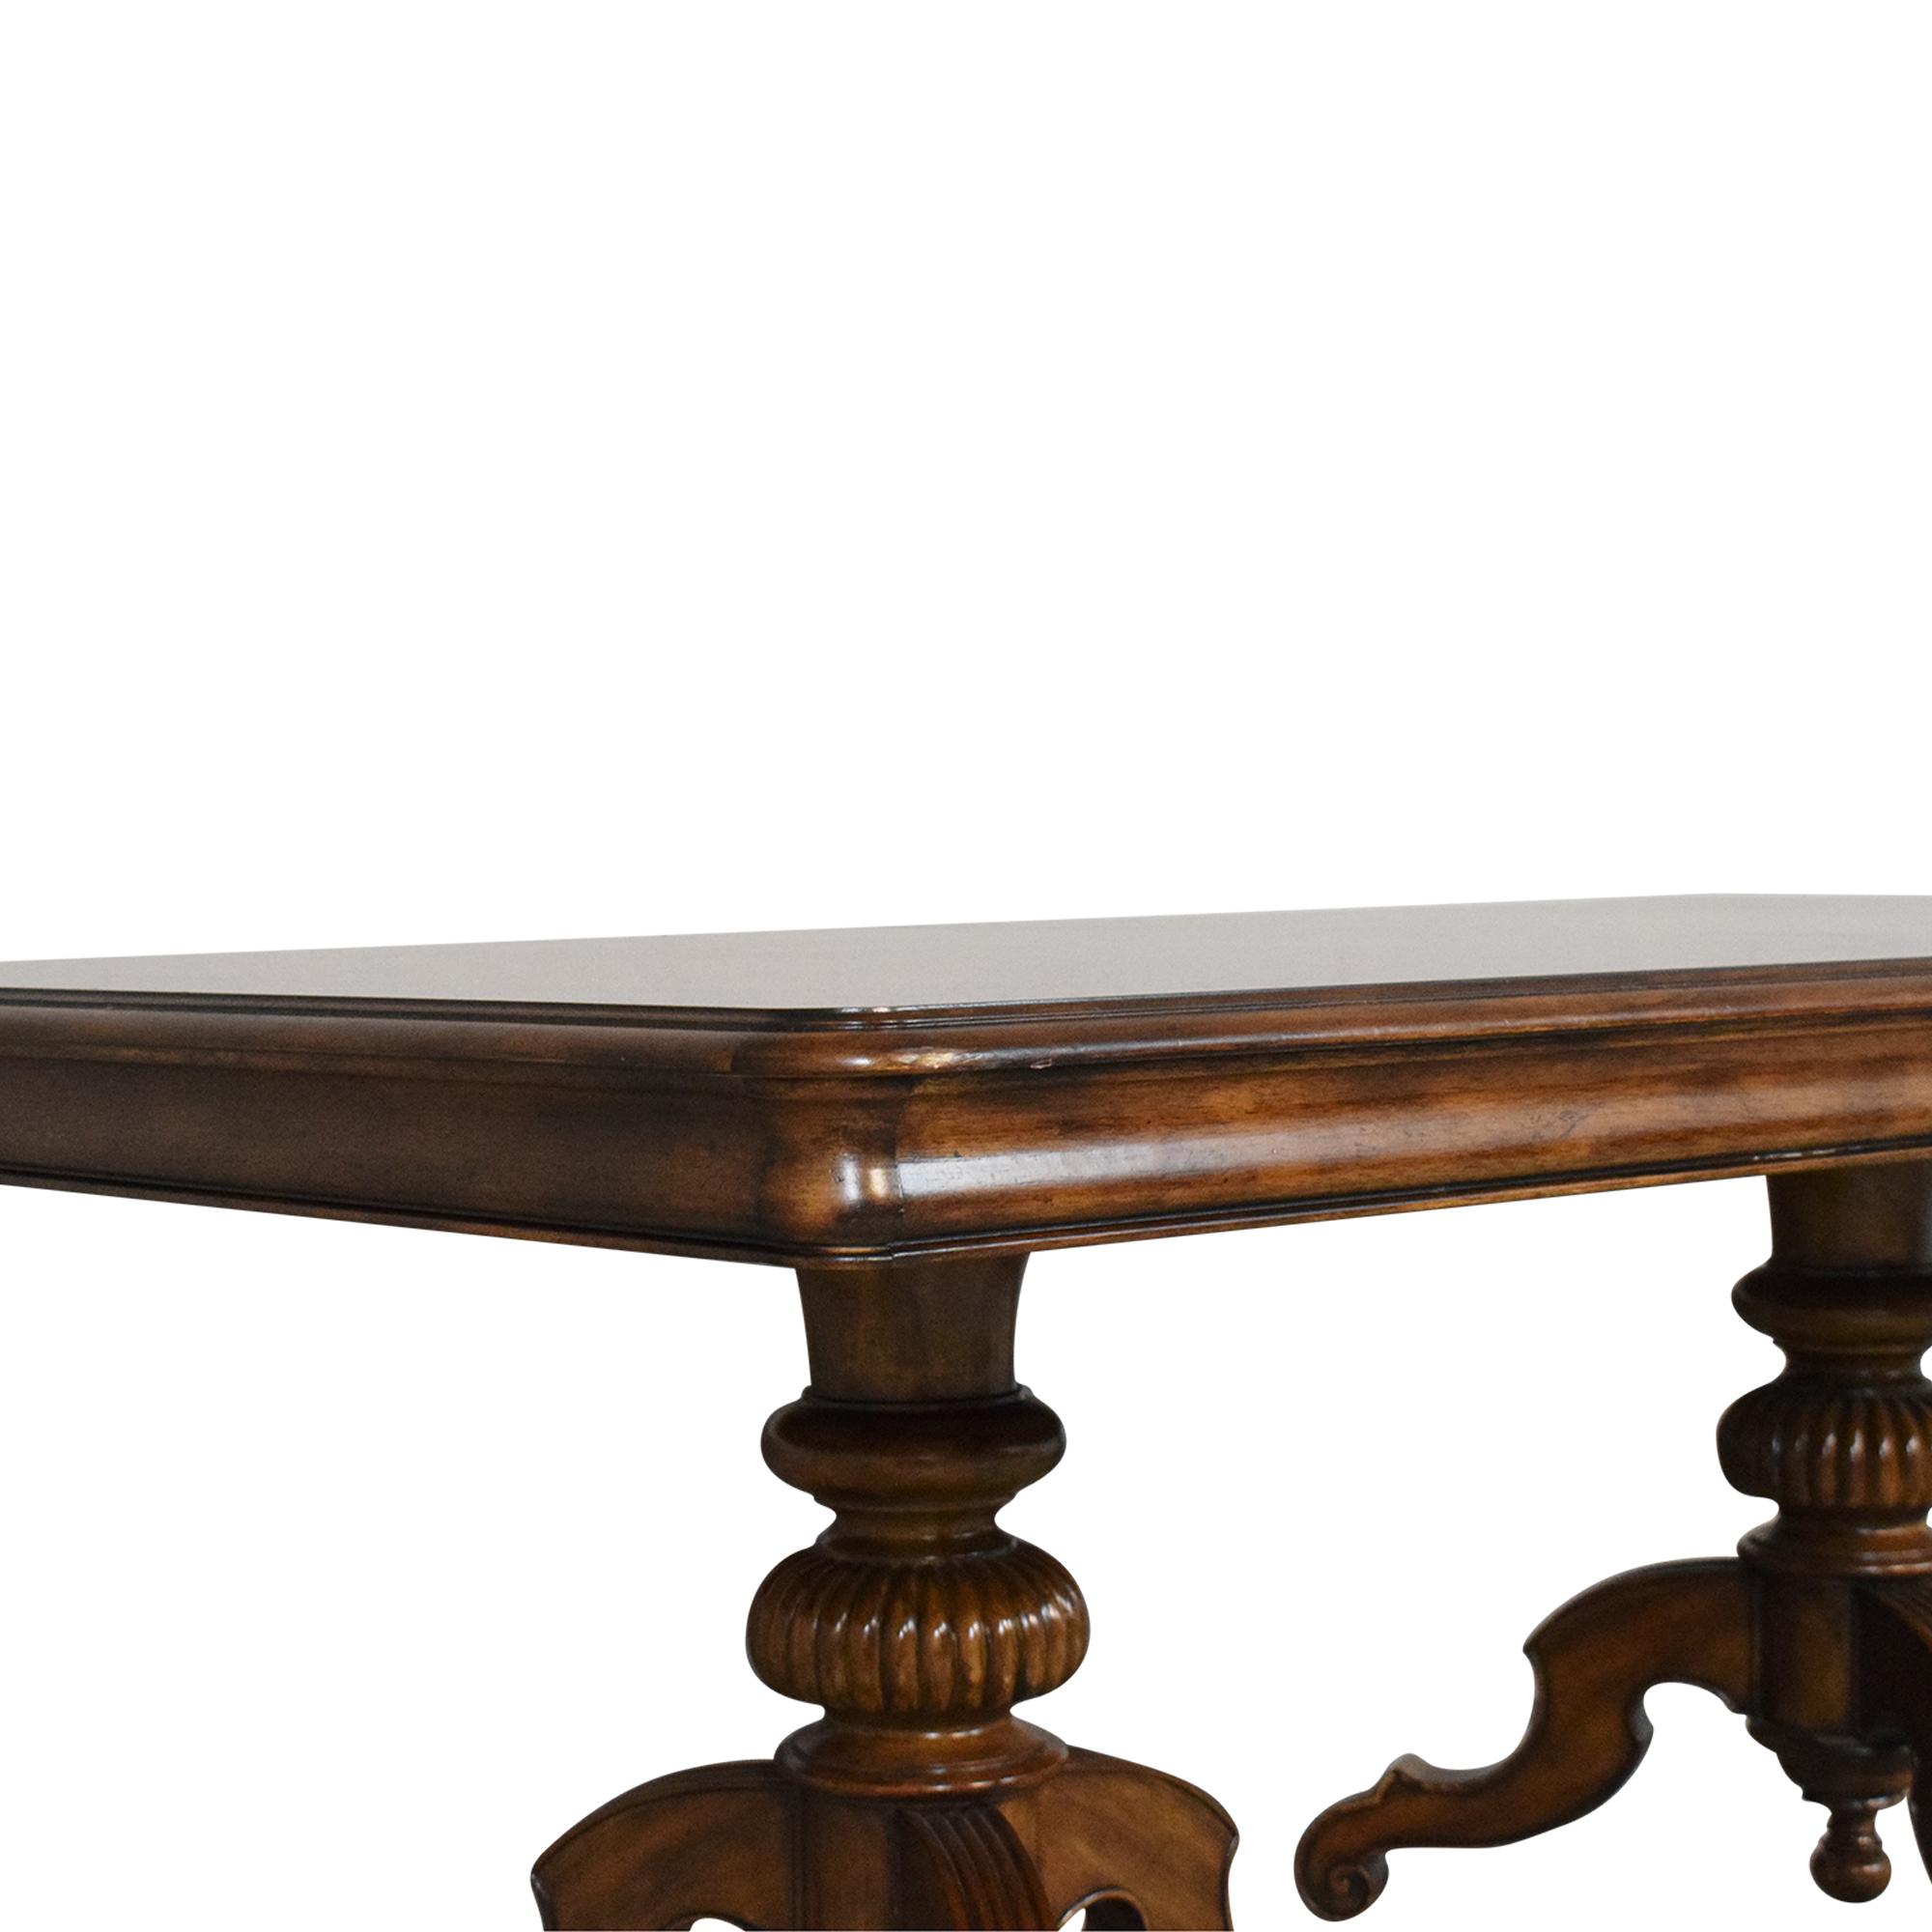 buy Thomasville Ernest Hemingway Castillian Double Pedestal Dining Table Thomasville Dinner Tables